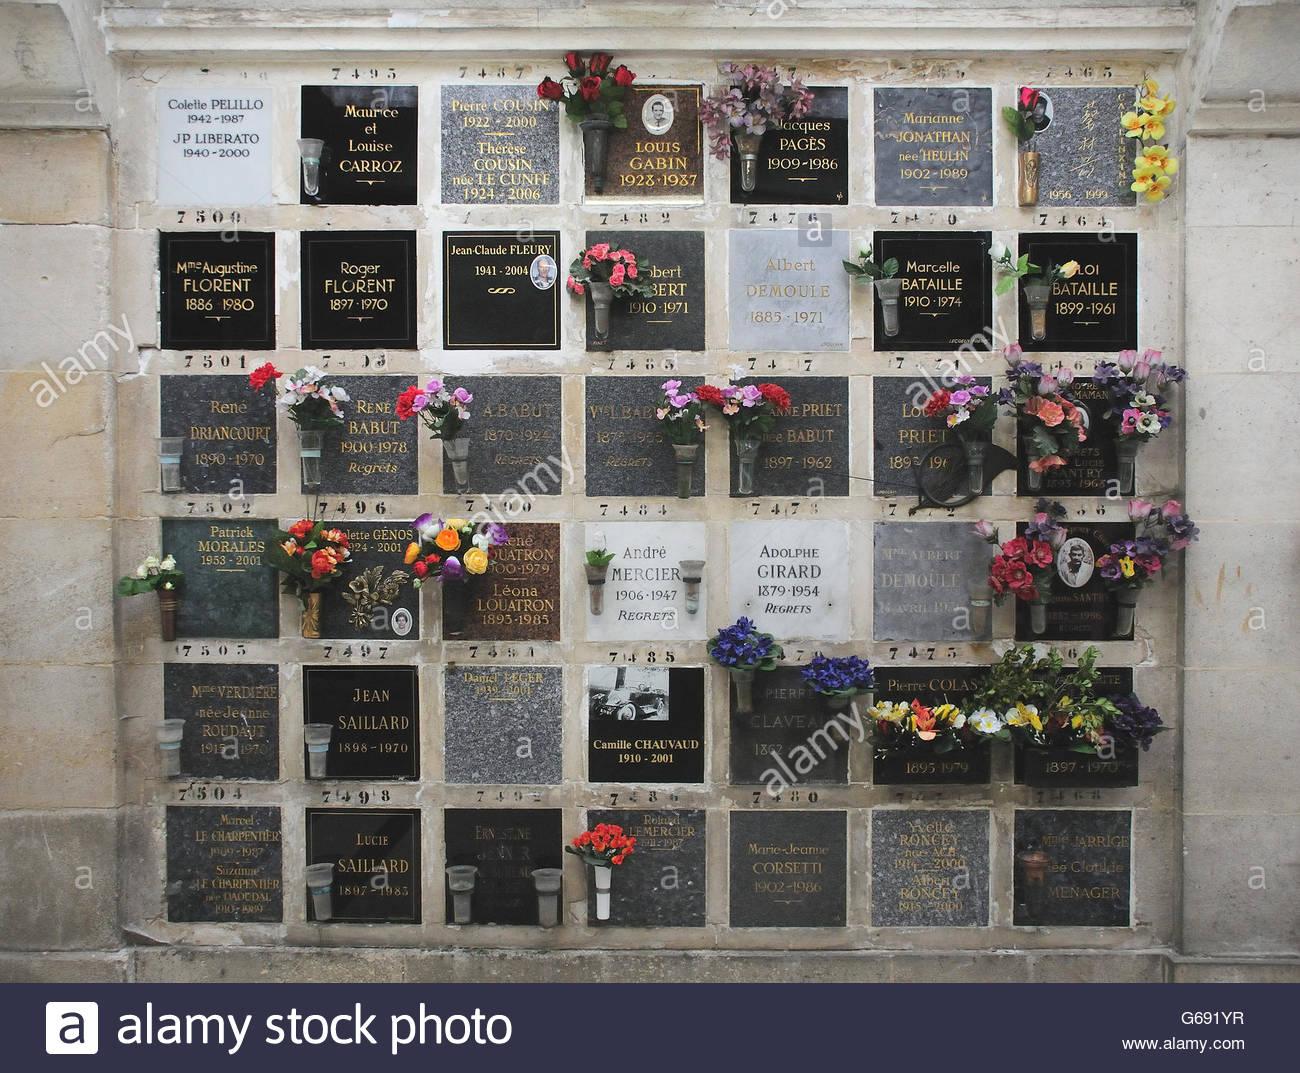 Plaques in the crematorium holding ashes. Pere Lachaise cemetery in Paris Stock Photo